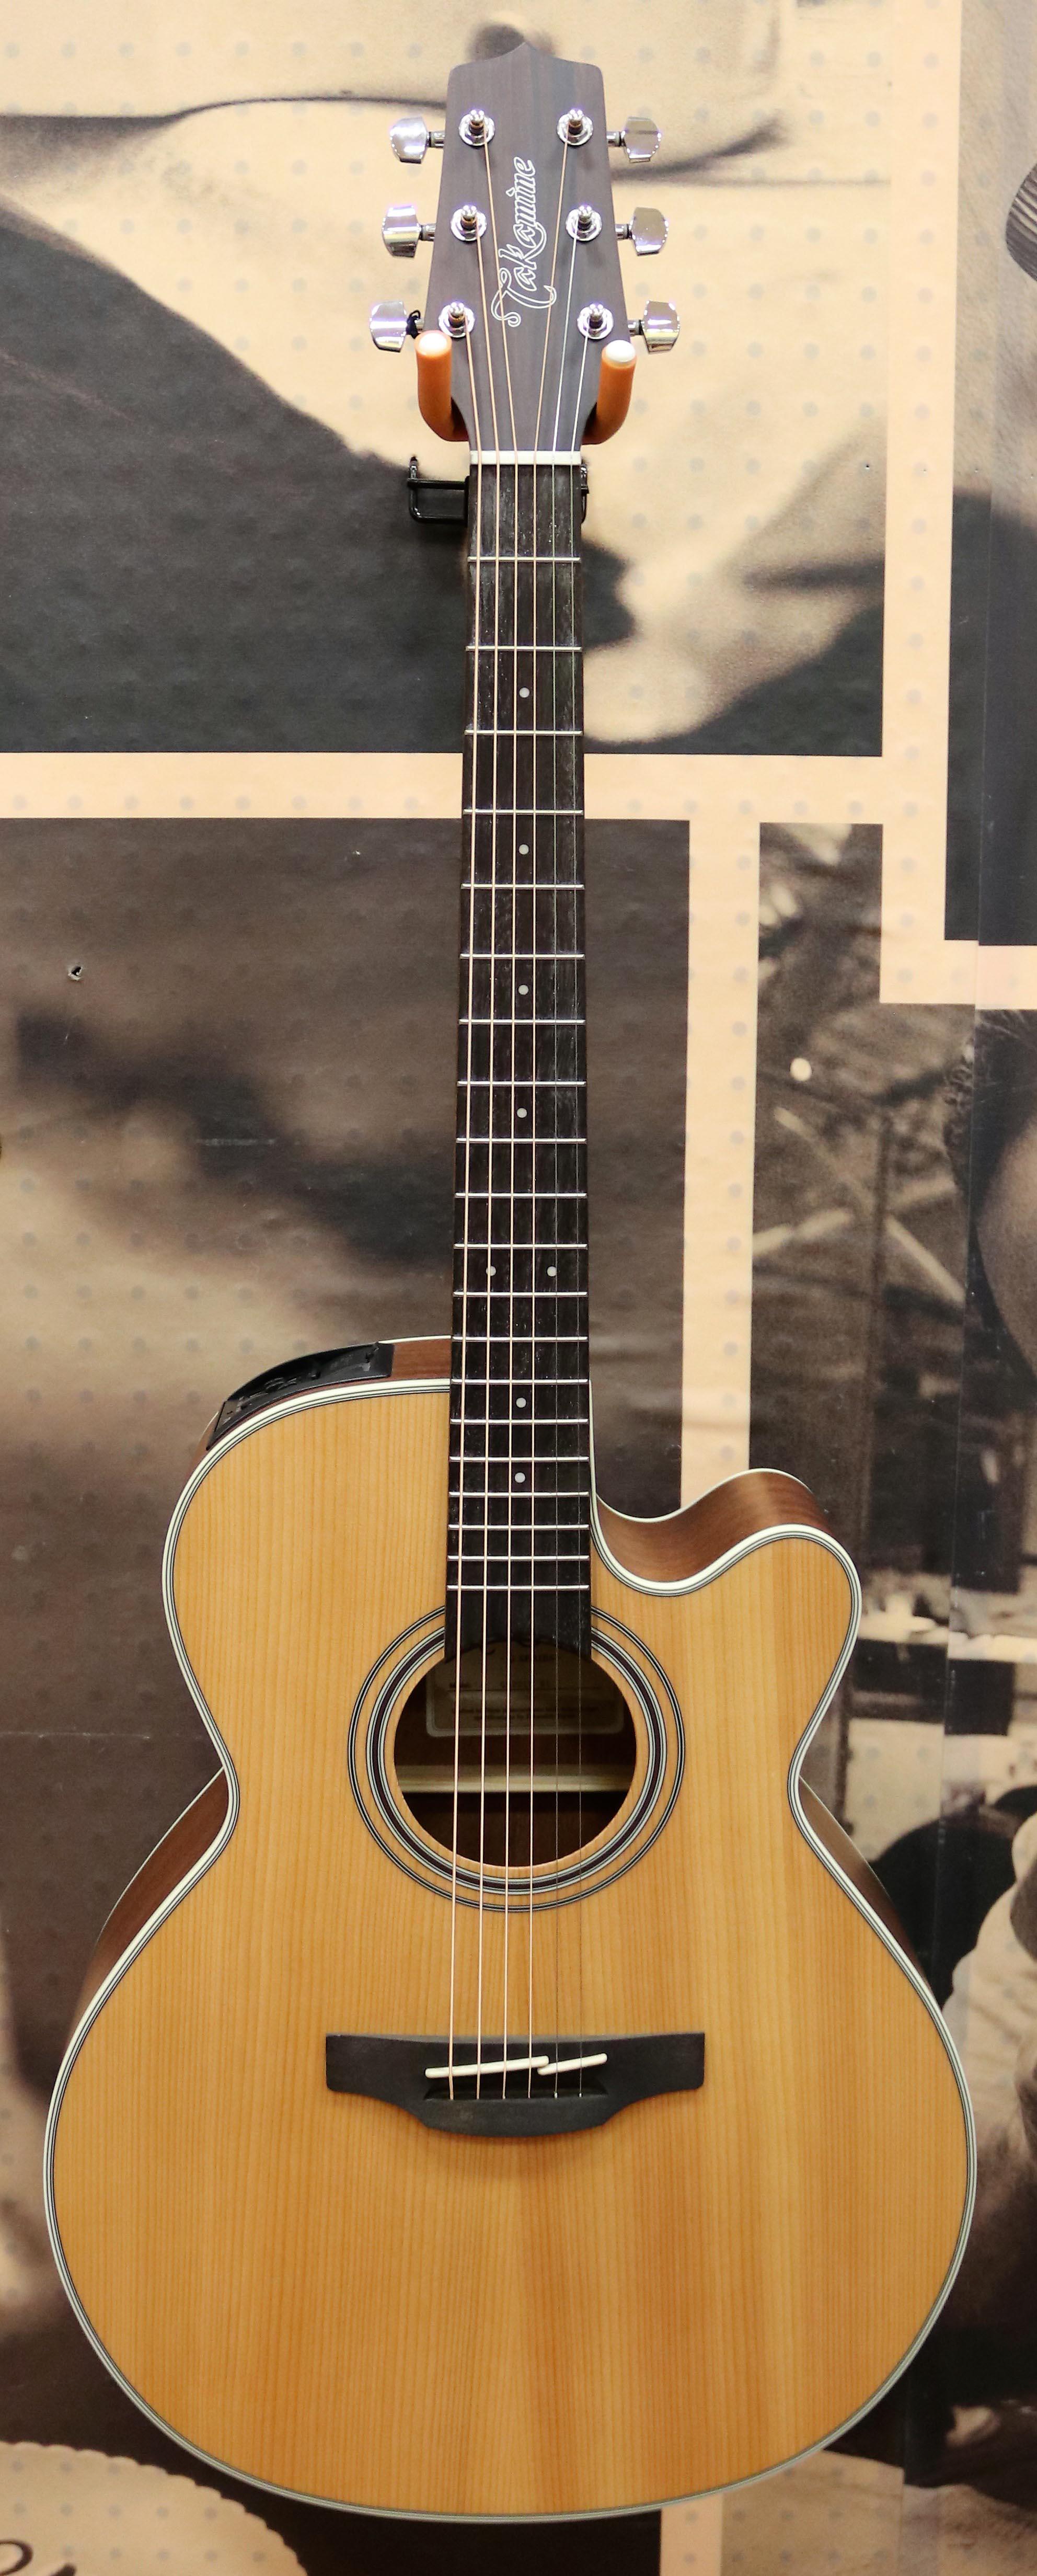 Musical Instruments & Gear Takamine Gf30cenat Fxc Cutaway Acoustic-electric Guitar Natural W/ Hard Case Big Clearance Sale